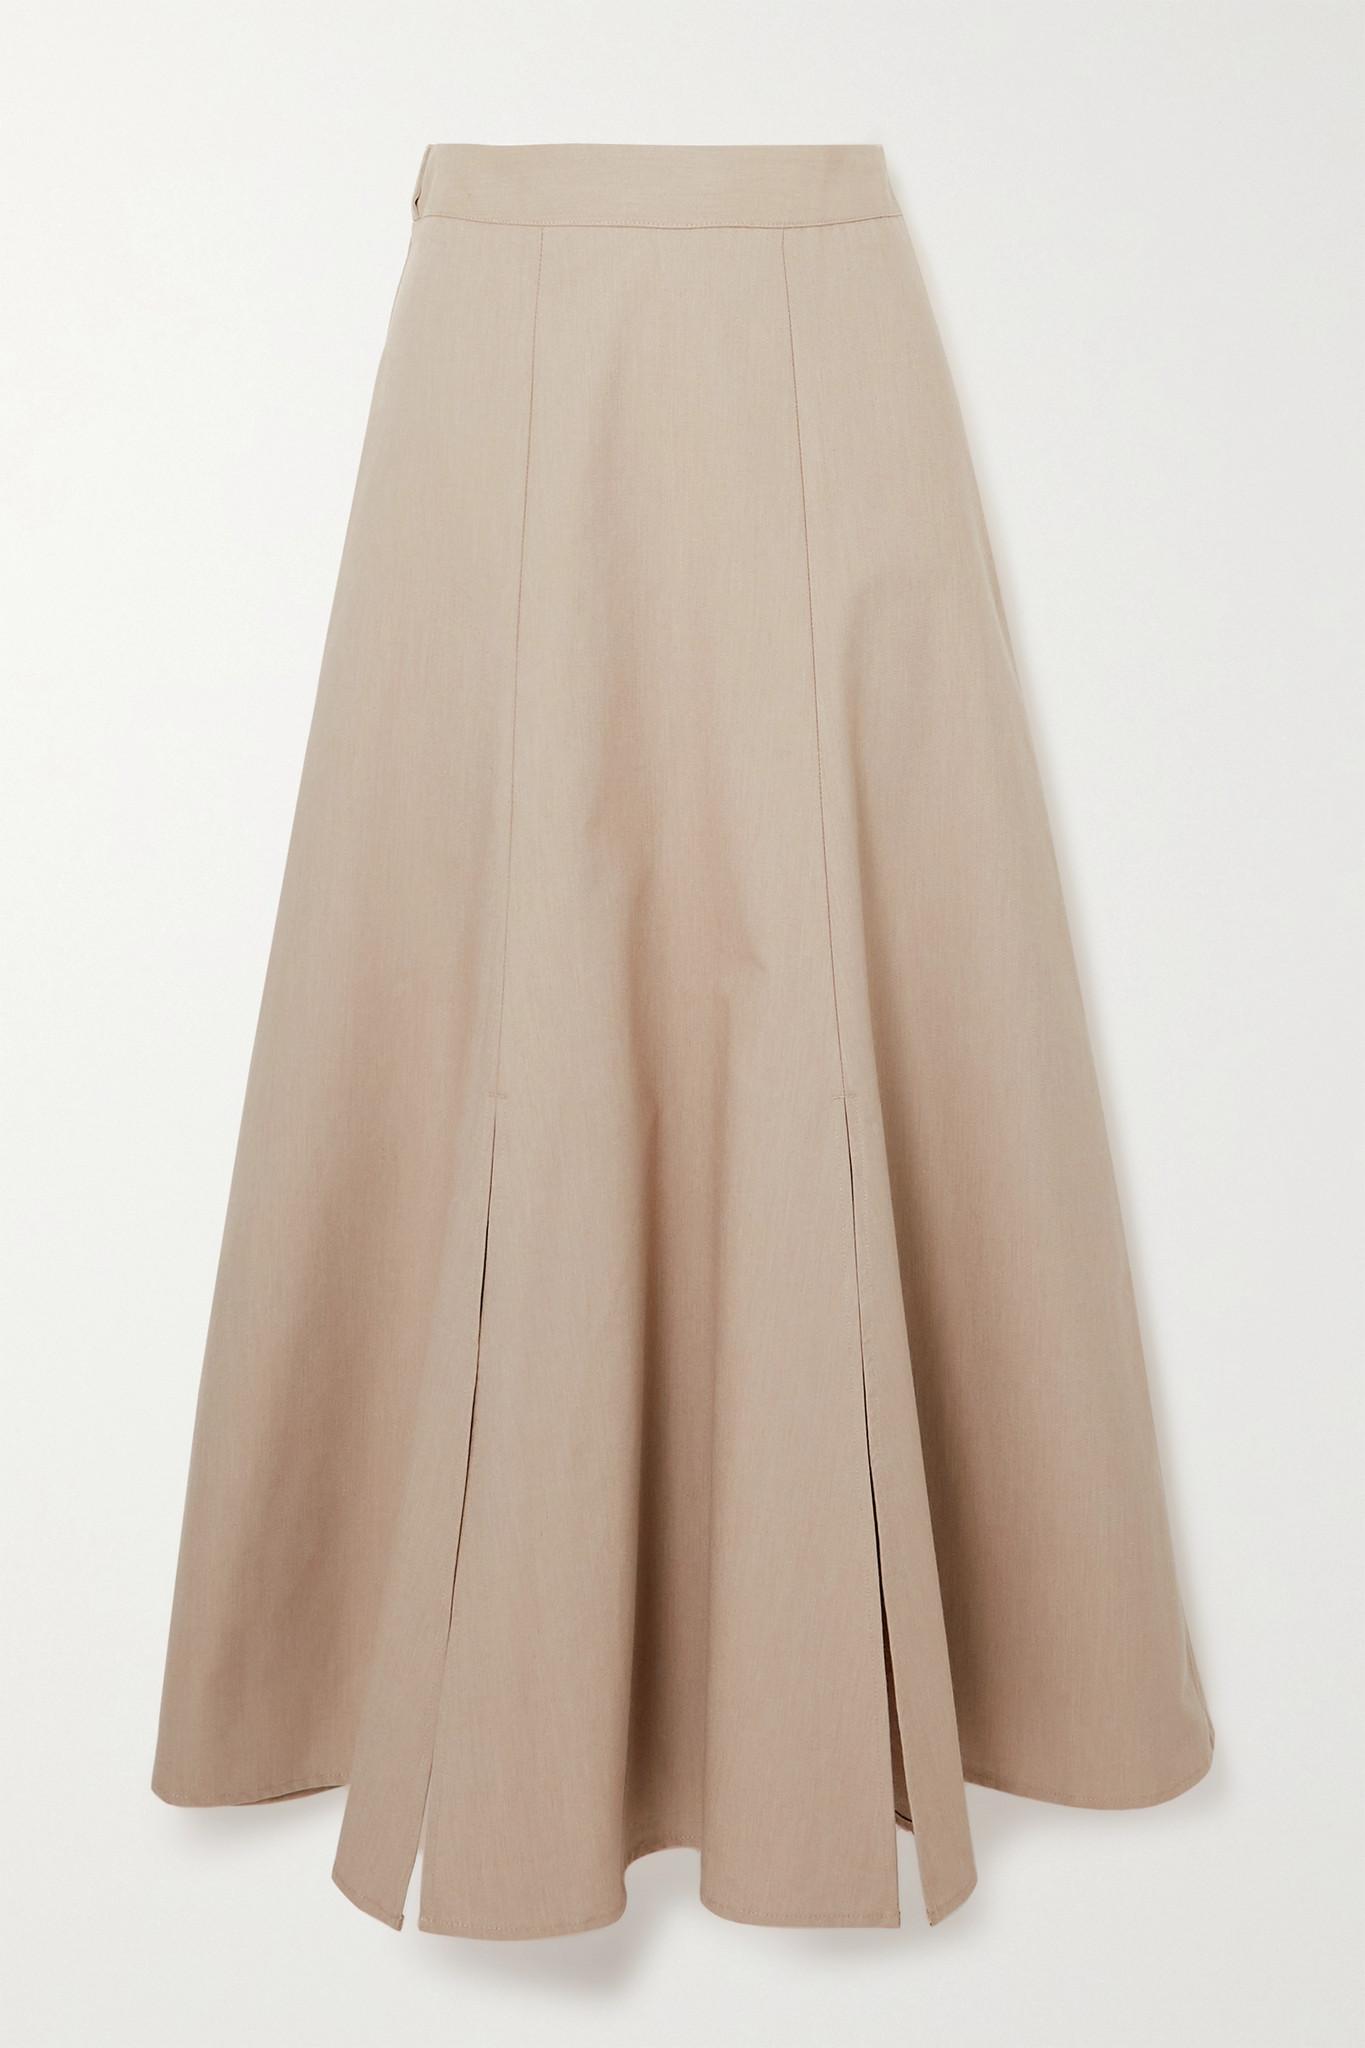 CAES - + Net Sustain Organic Cotton-poplin Midi Skirt - Neutrals - small